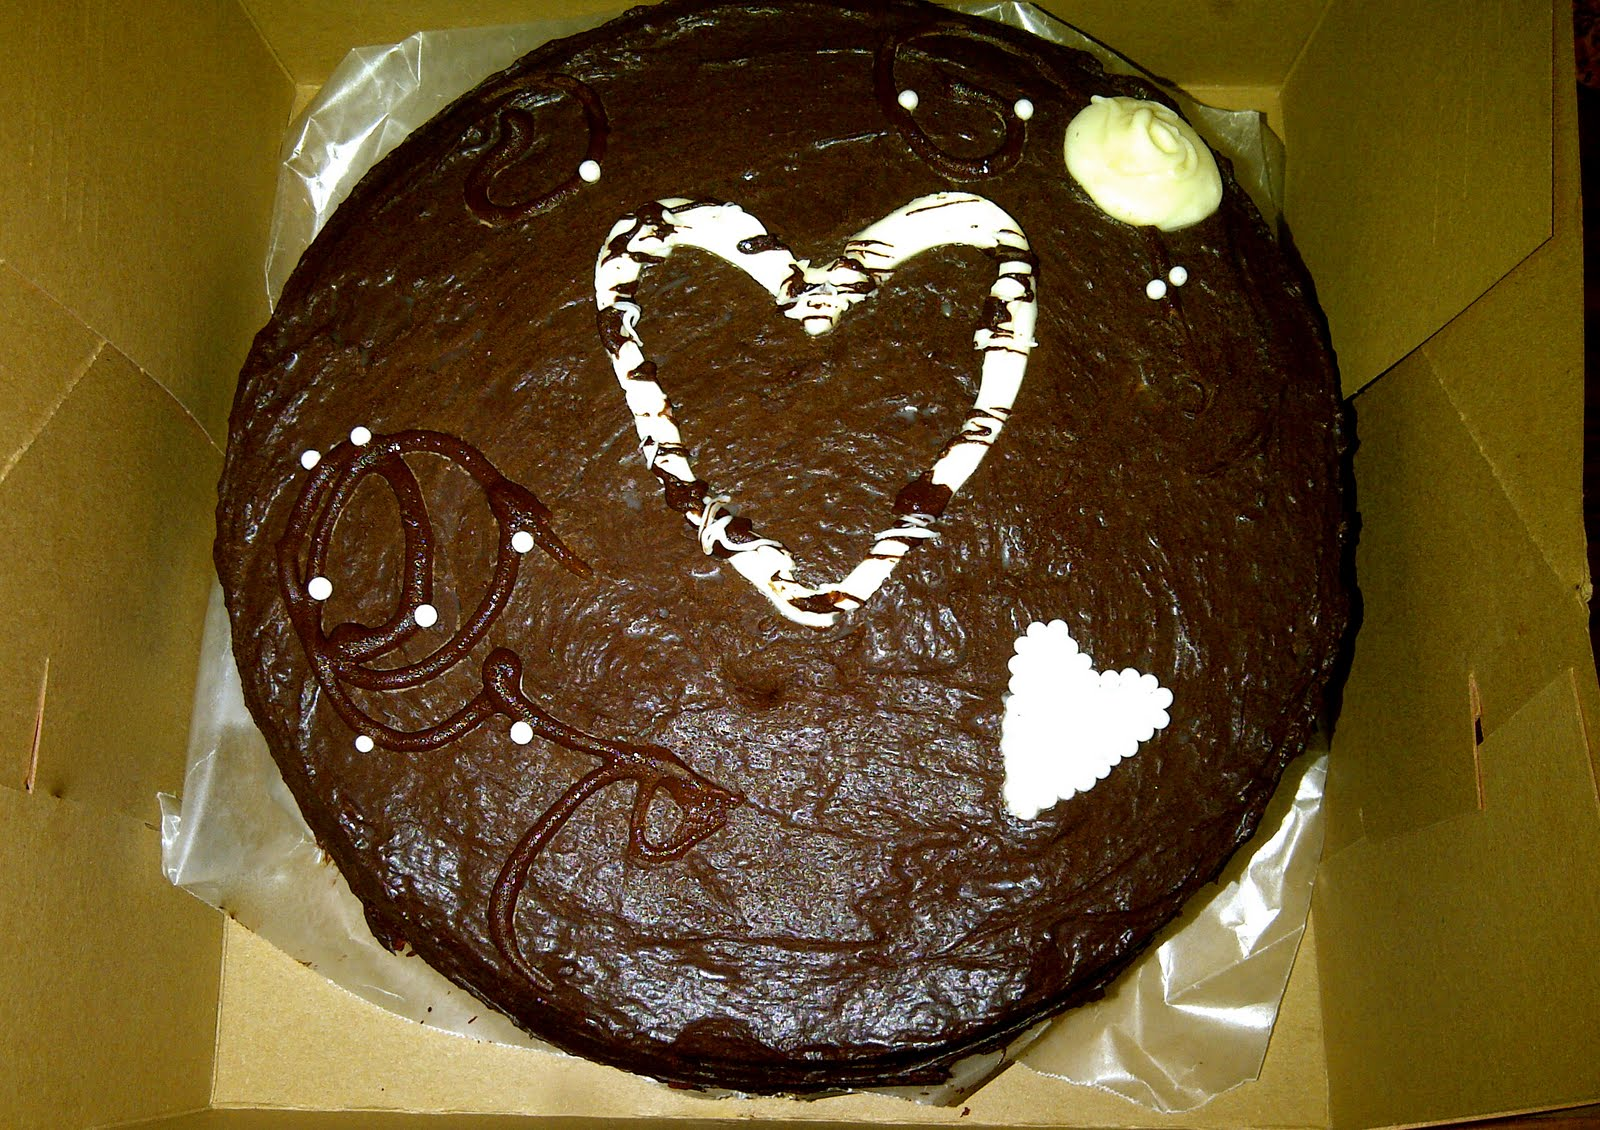 Red Velvet Cake That Snot Chocolate